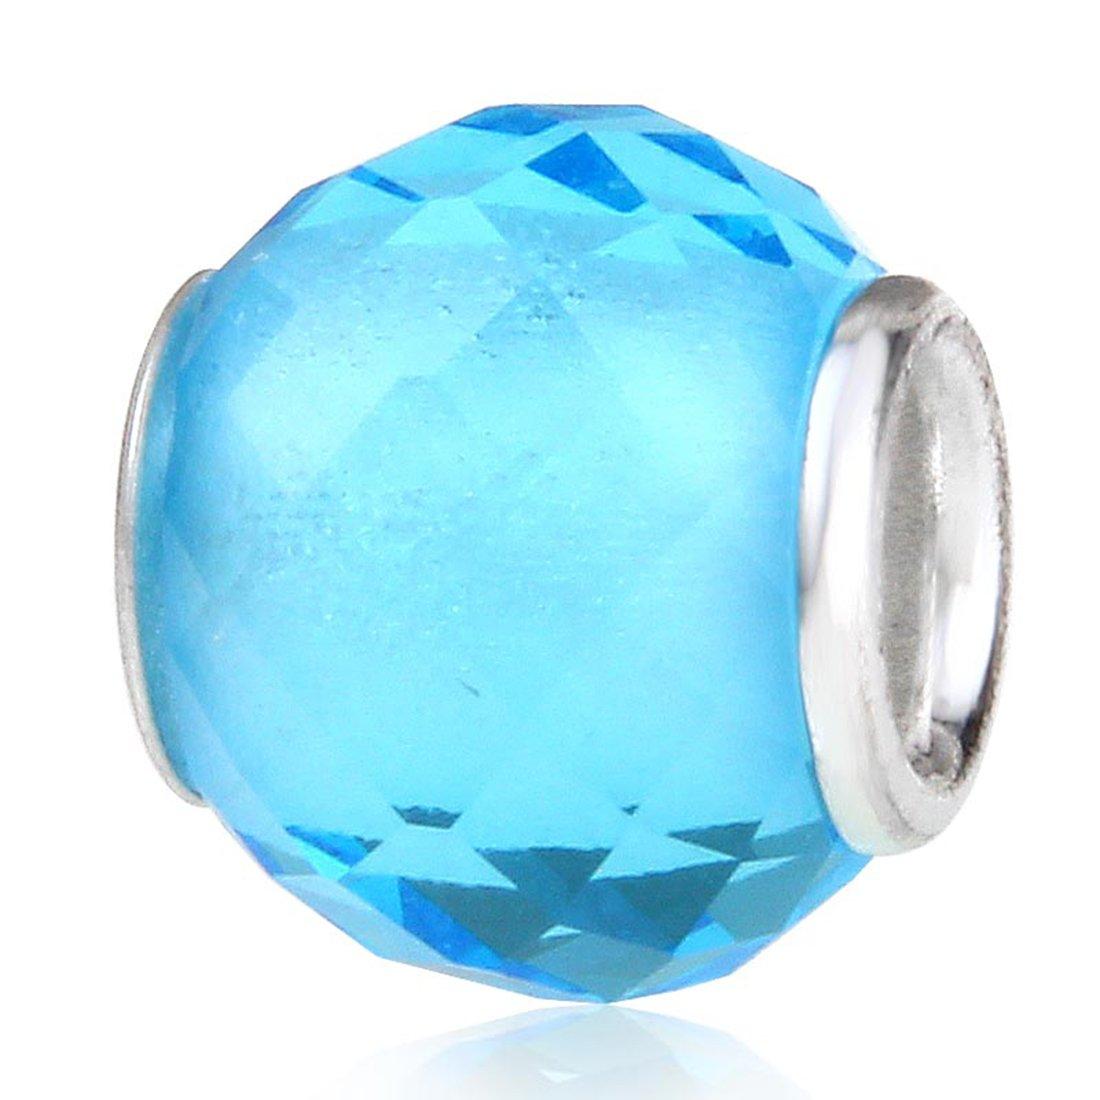 97b9c377bb2f3 Glsas Birthstone Charm with 925 Sterling Silver Core Birthday Charm  Anniversary Charm for Pandora Charms Bracelelt (March)